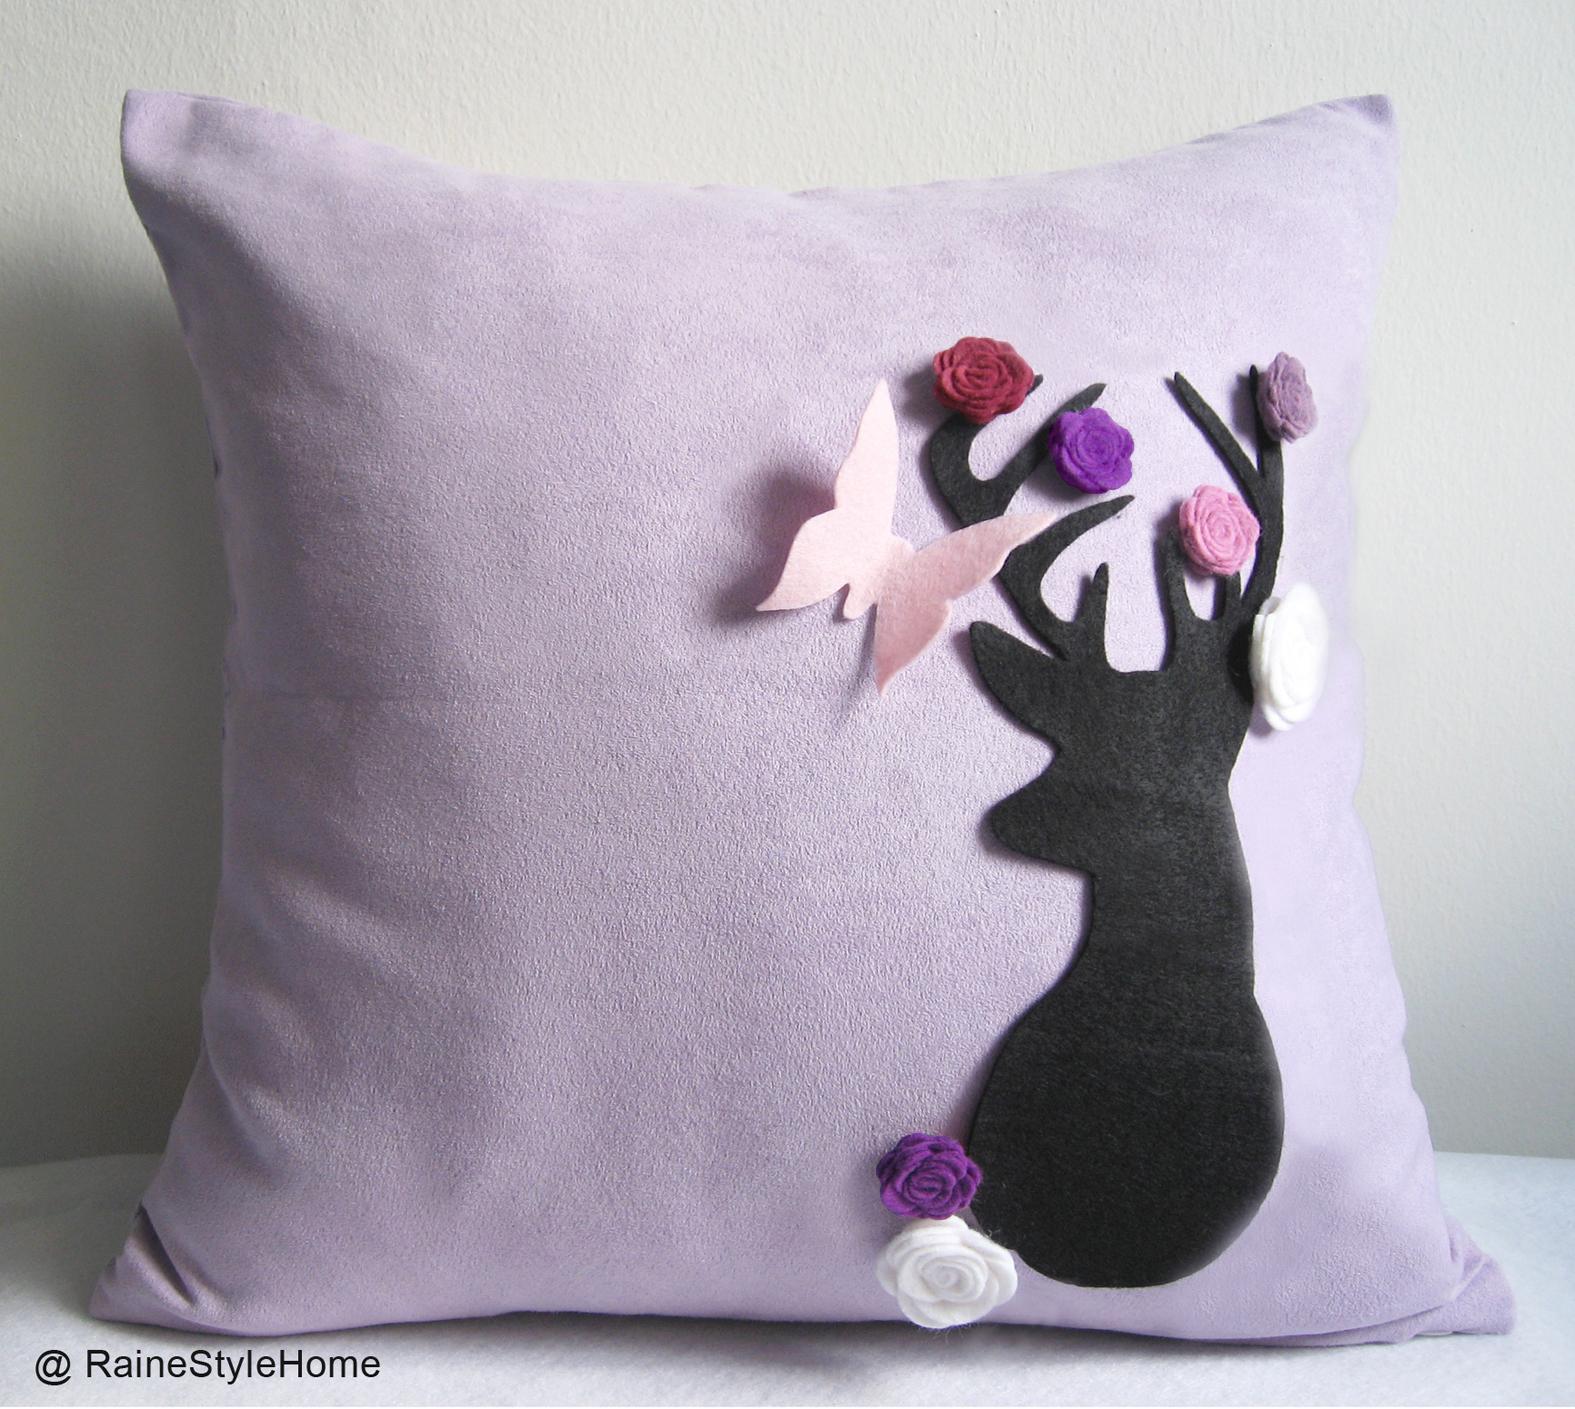 Handmade Pillow Cover. Secret Garden. Deer Dreaming Of Spring Soft Lilac Cushion